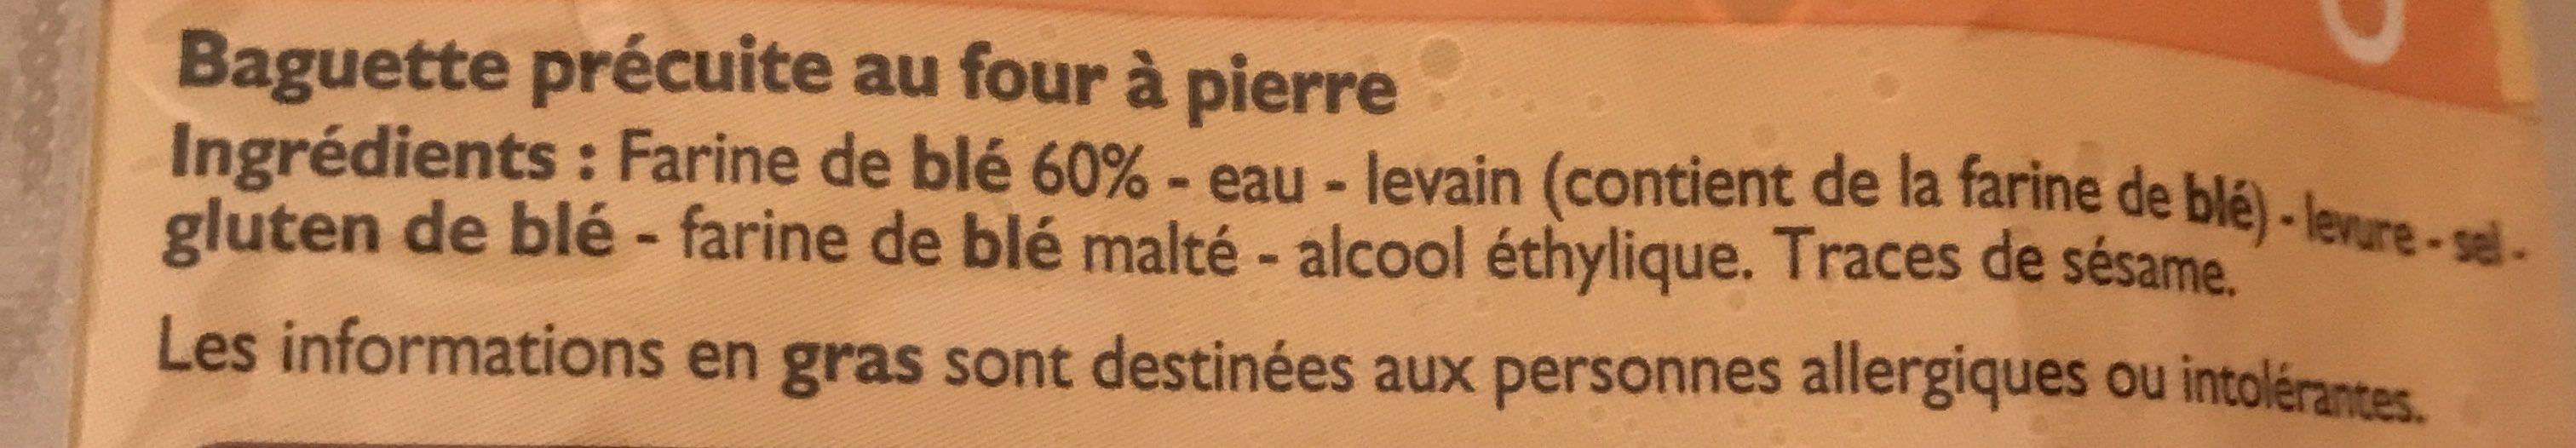 Baguette précuite - Ingrediënten - fr